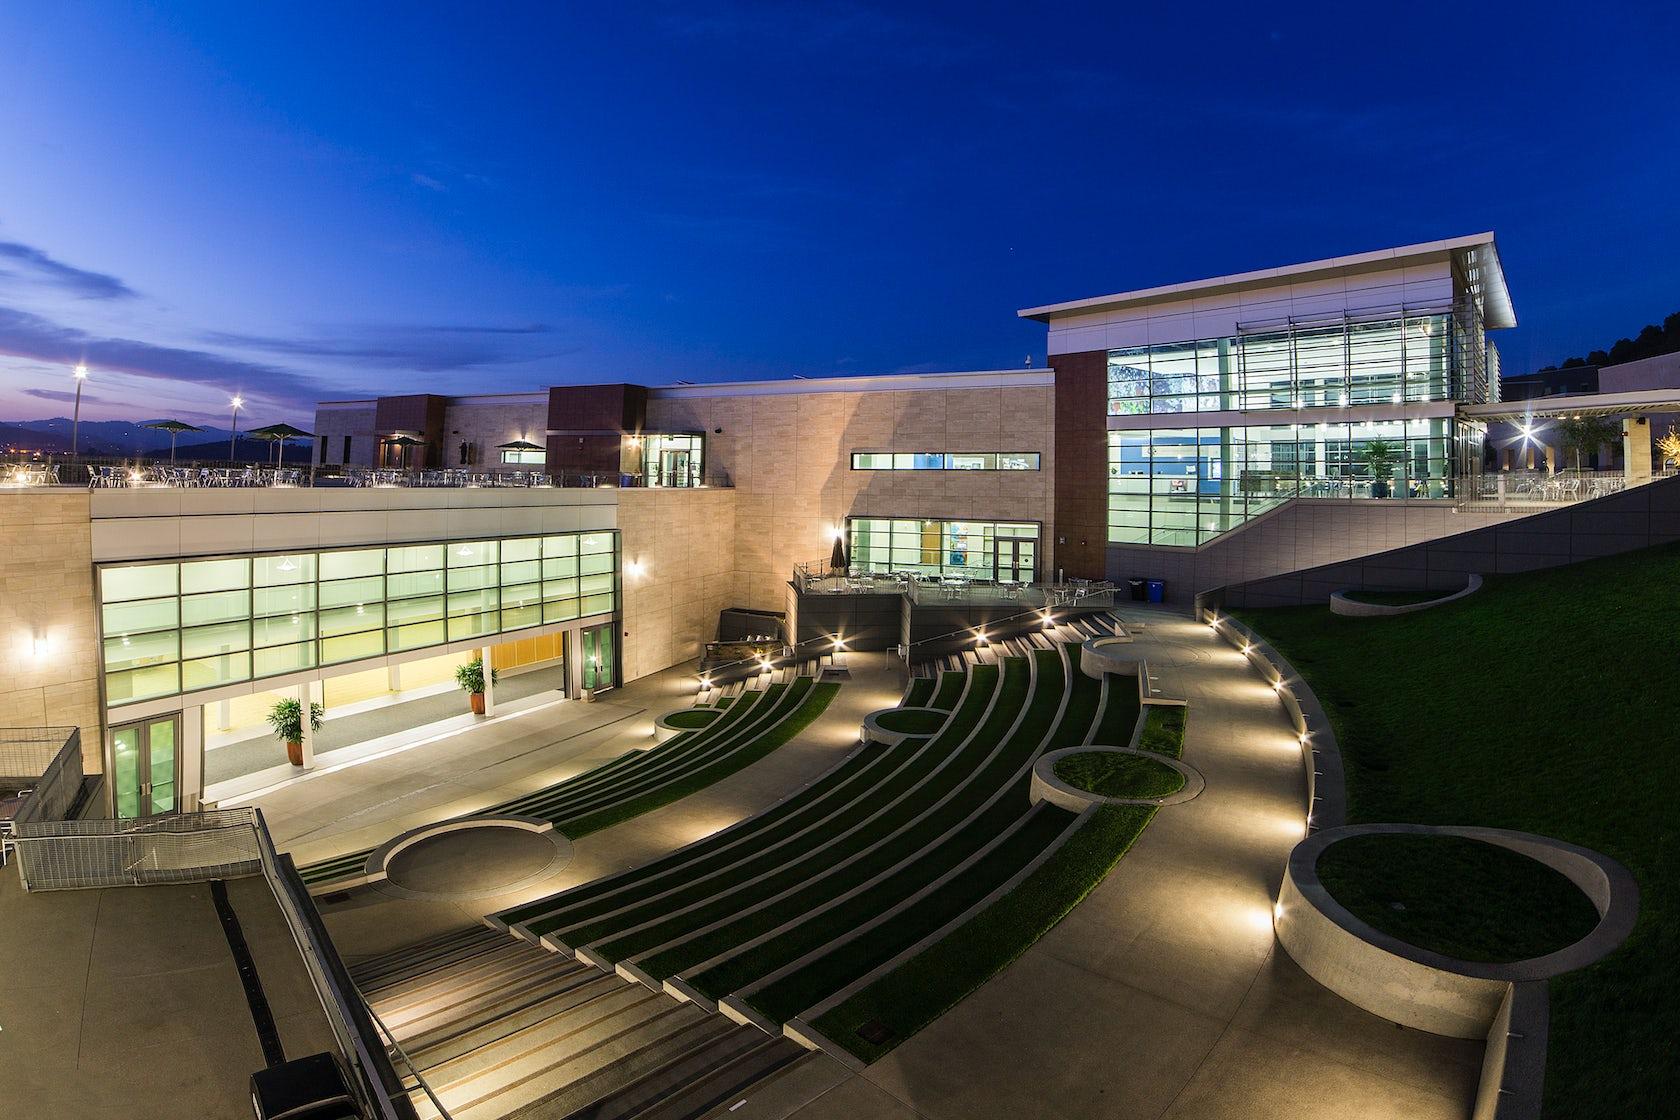 Csu San Marcos >> University Student Union | California State University San